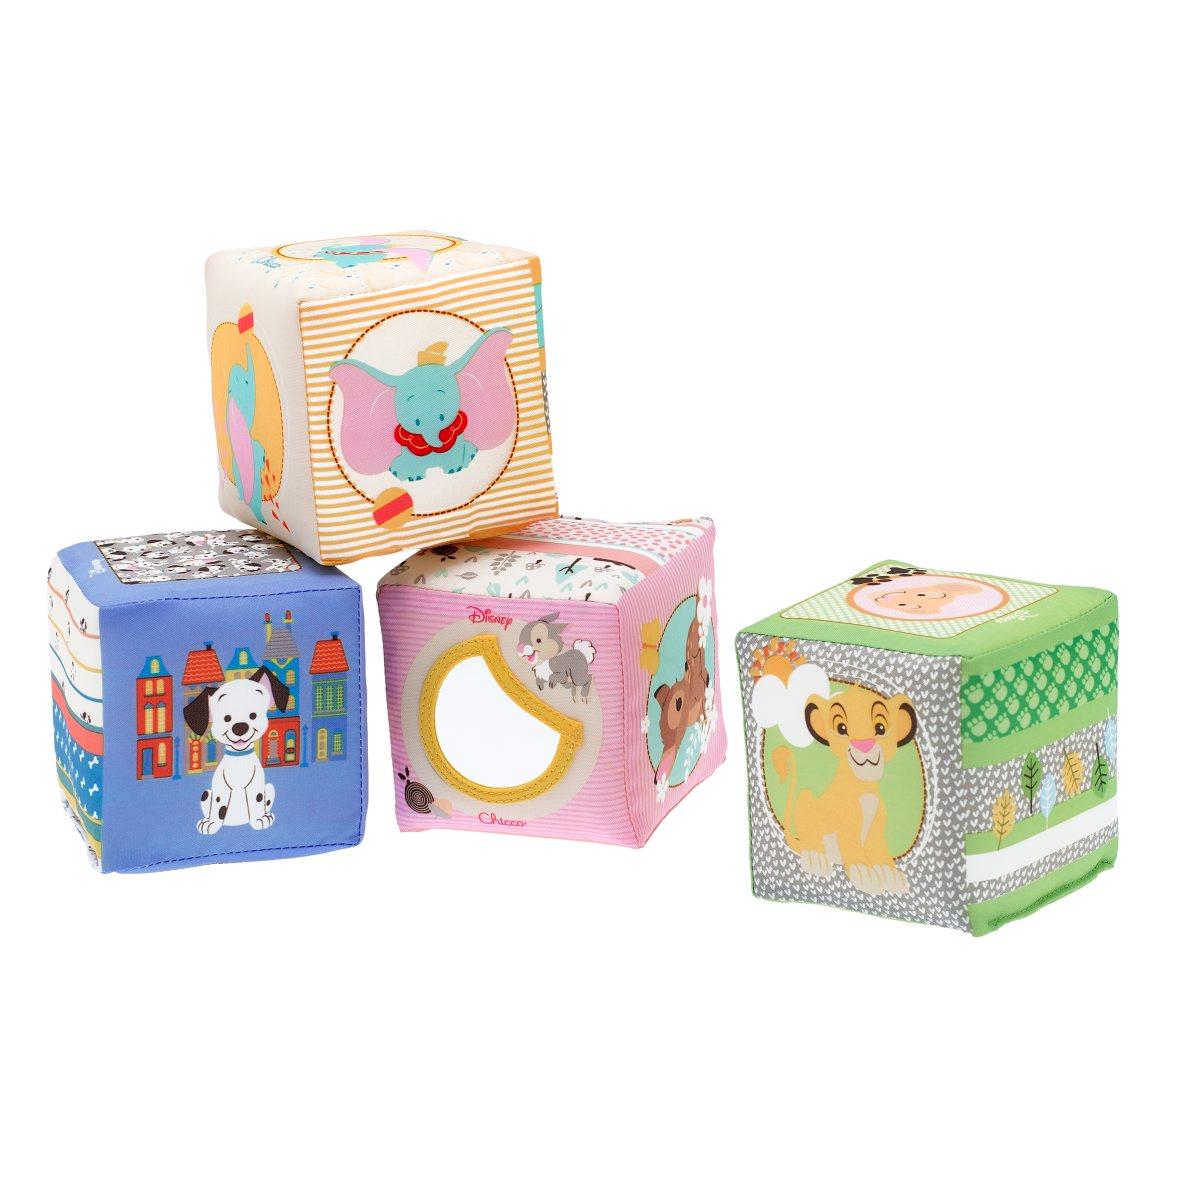 Chicco Мягкие кубики Disney00007518000000